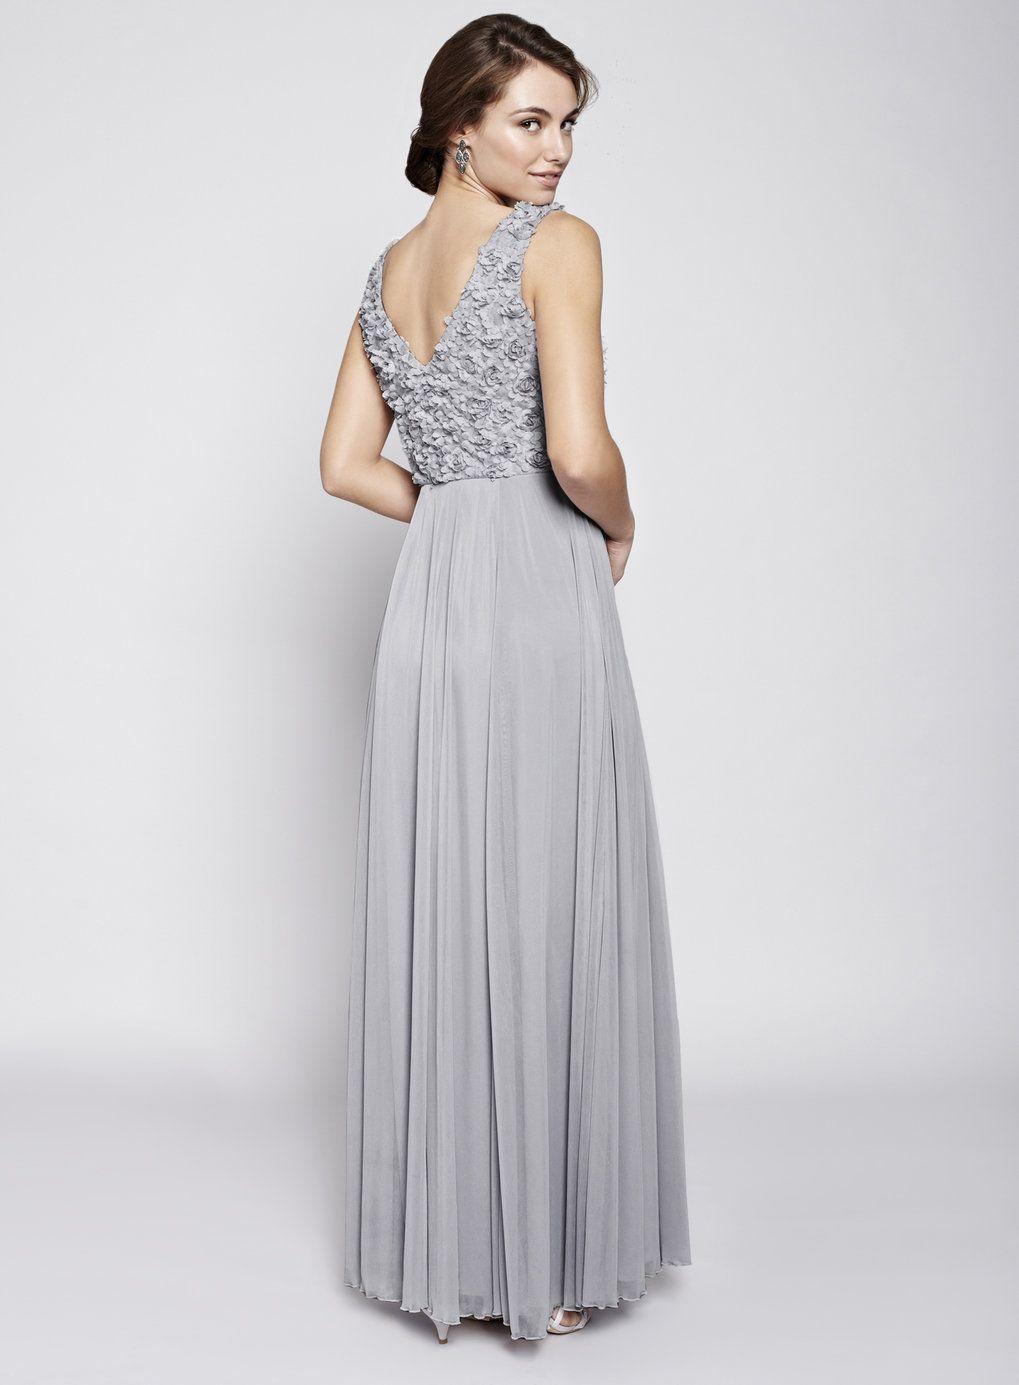 Bridesmaid dress grey grey bridesmaid dress pinterest more bridesmaid dress grey ombrellifo Choice Image